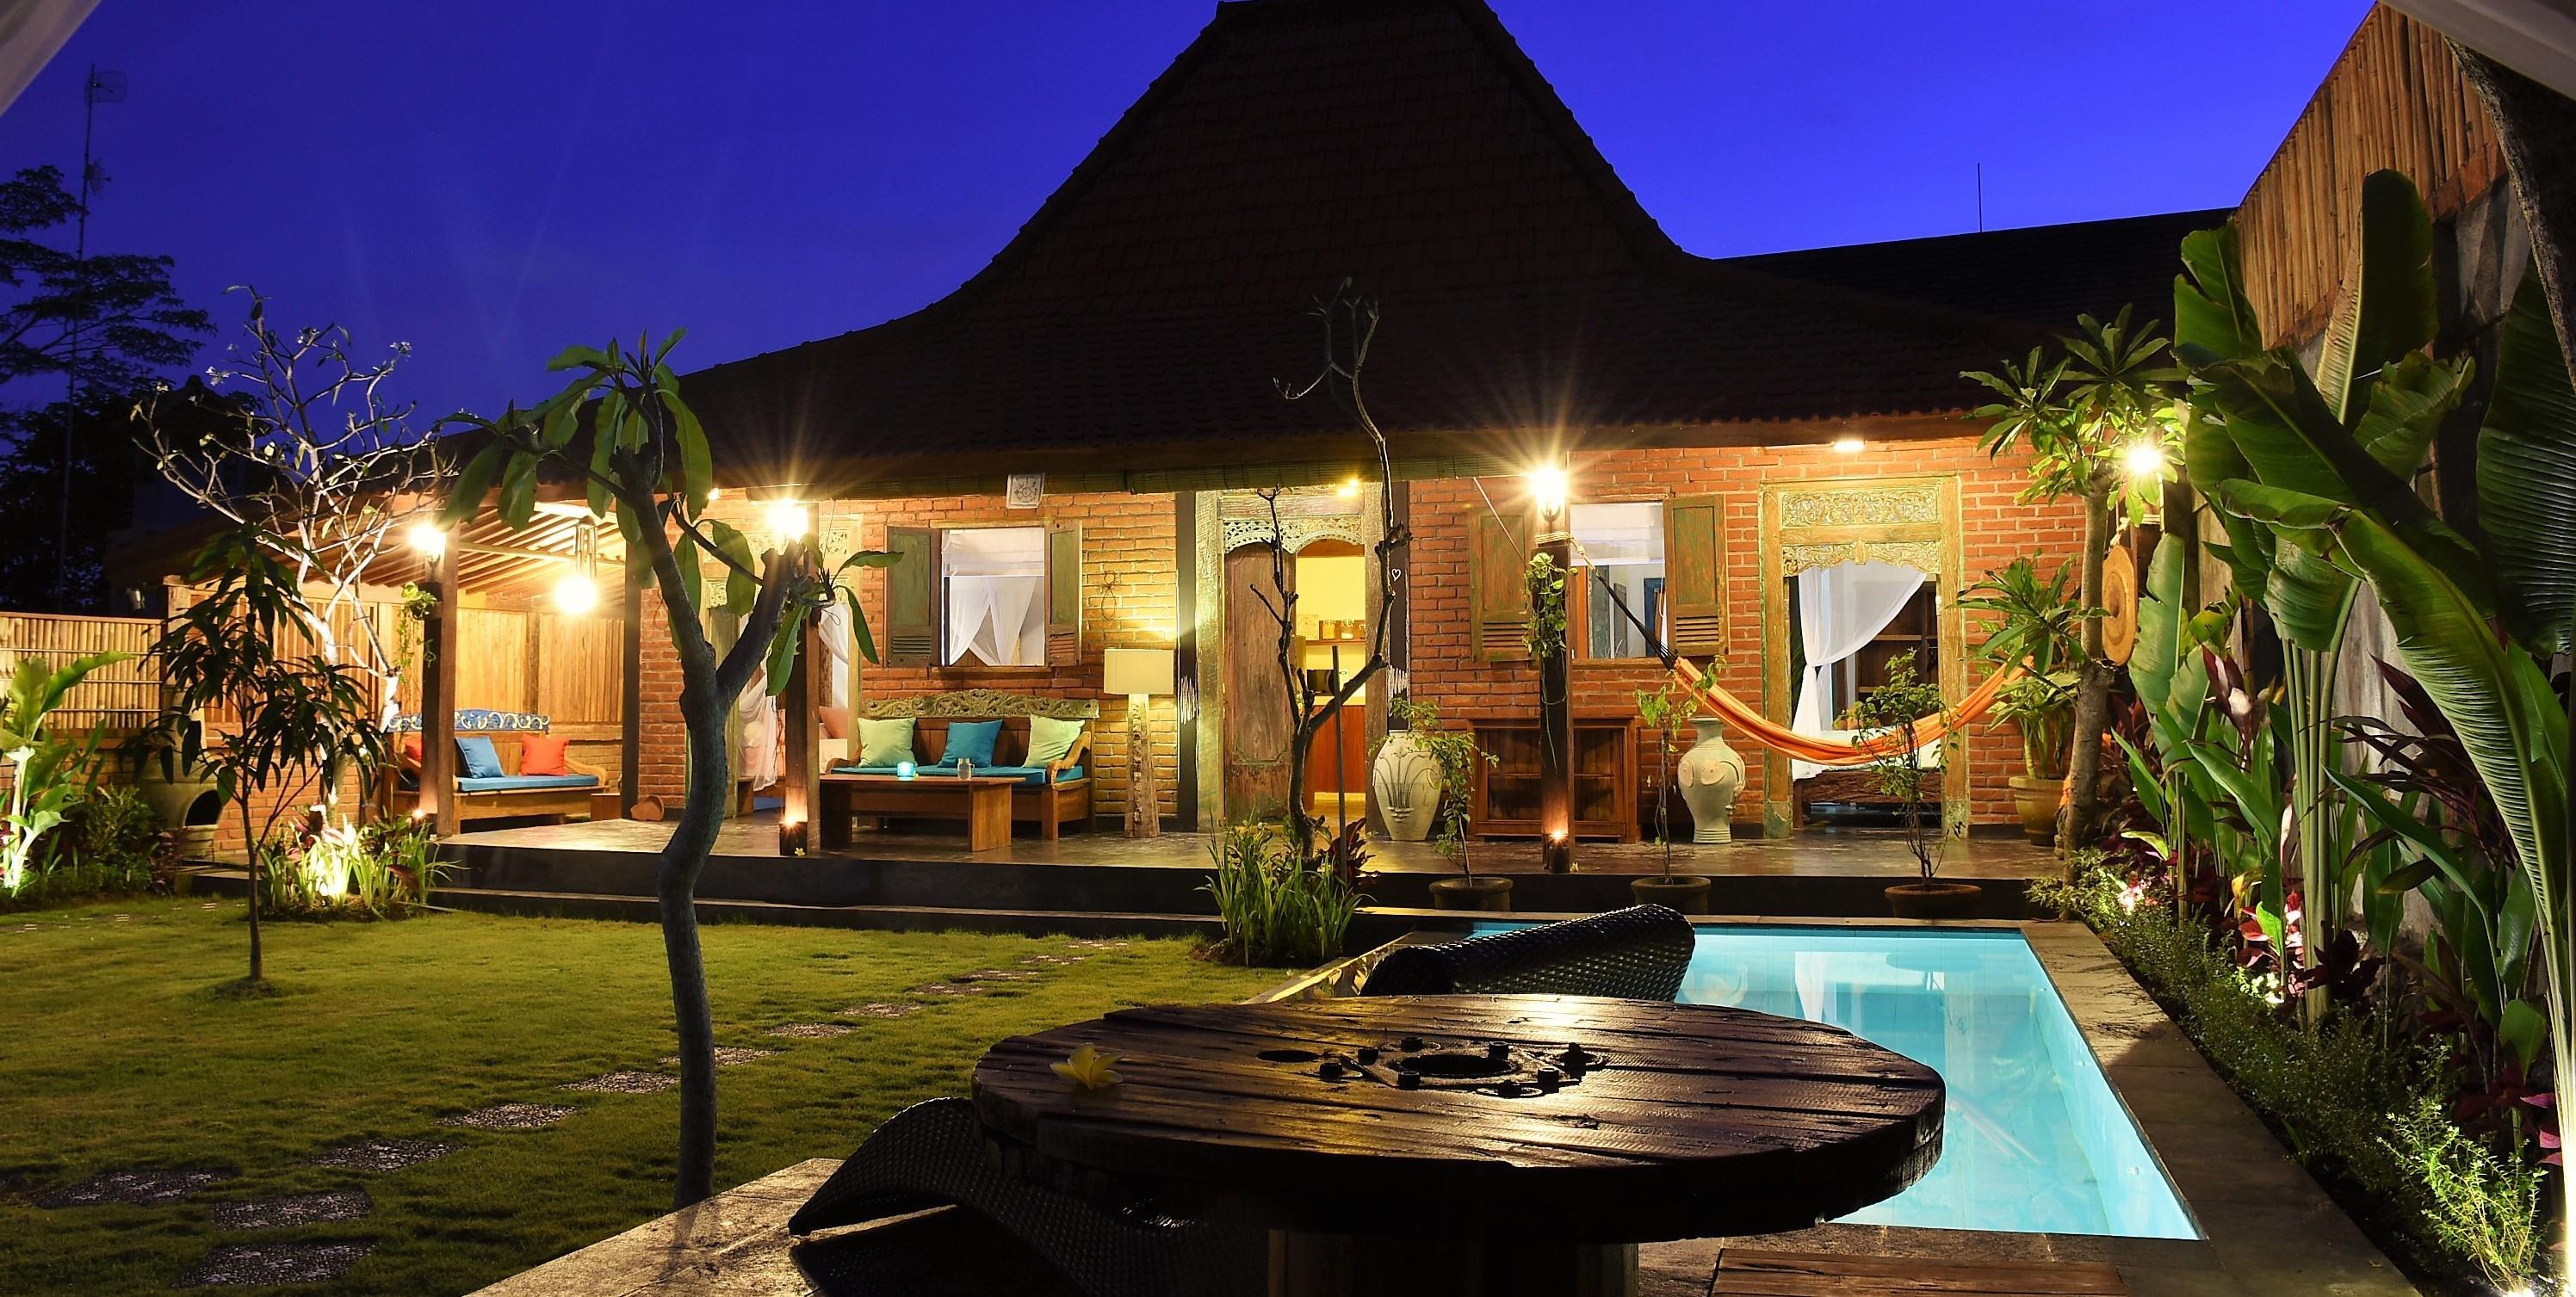 Kampung Coklat Villa Bali ホテル詳細